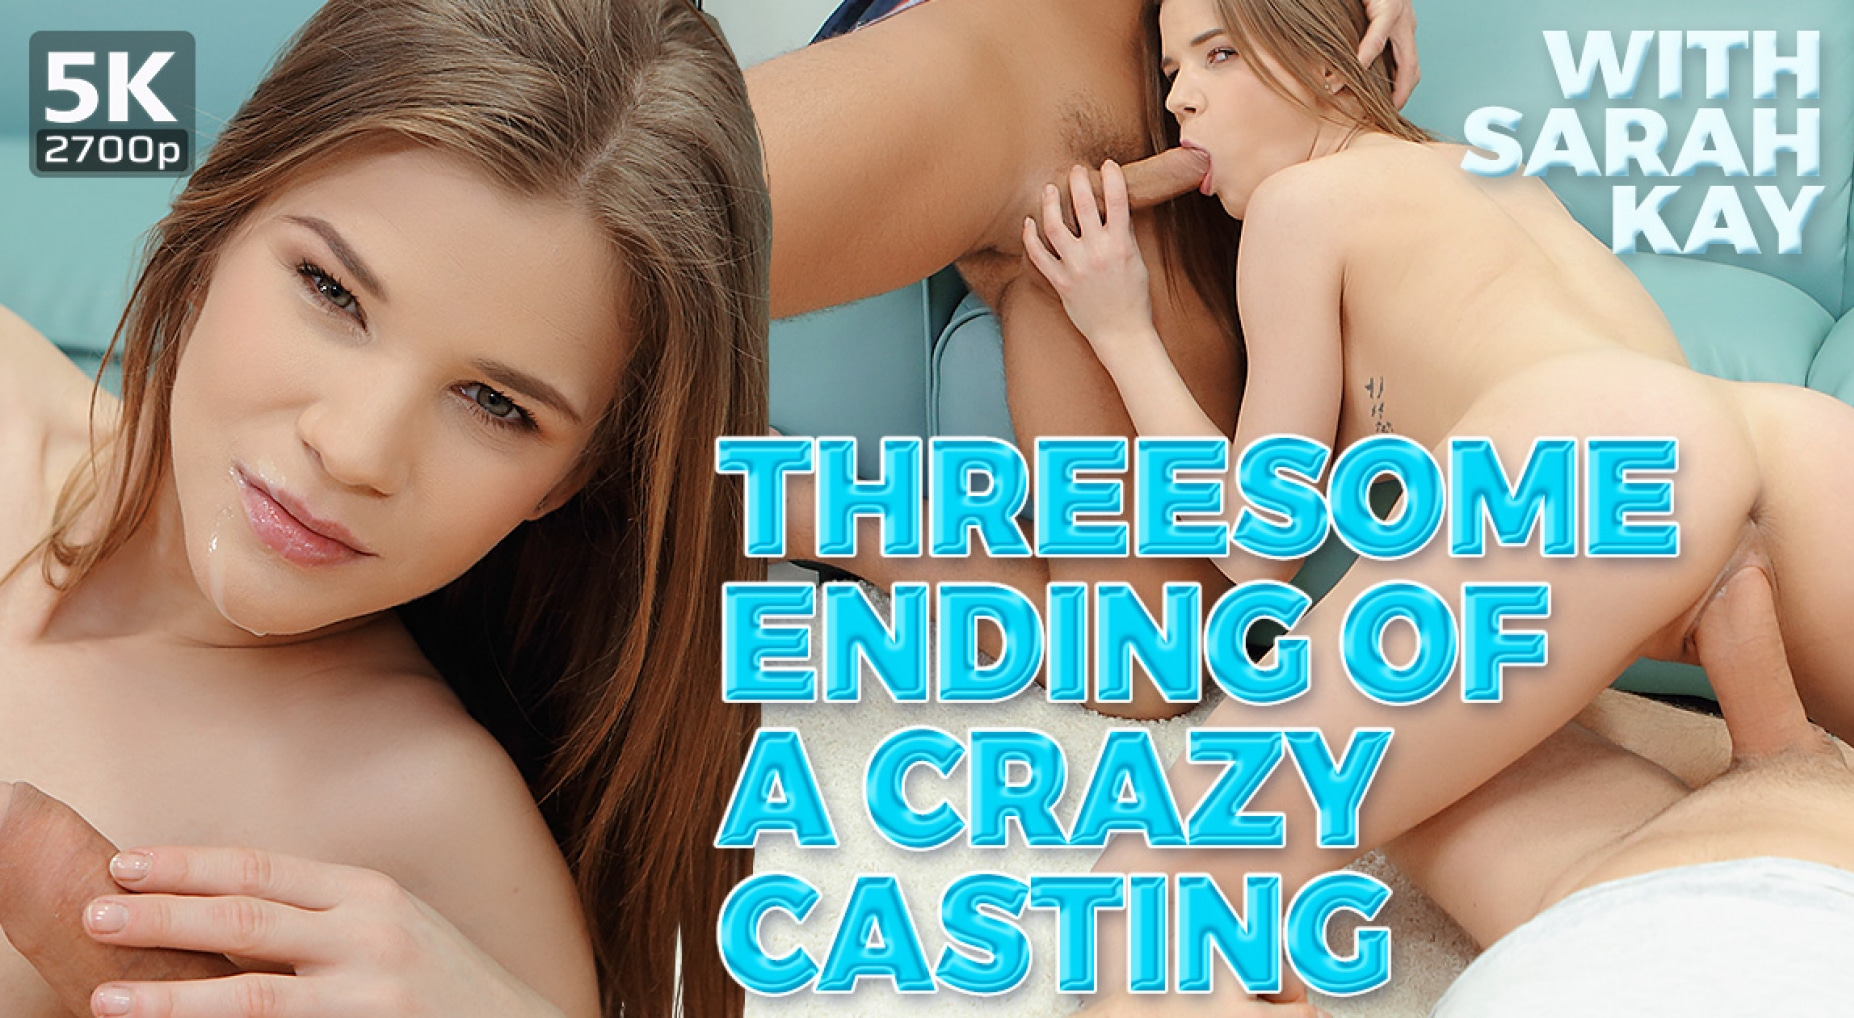 Threesome Ending Of A Crazy Casting